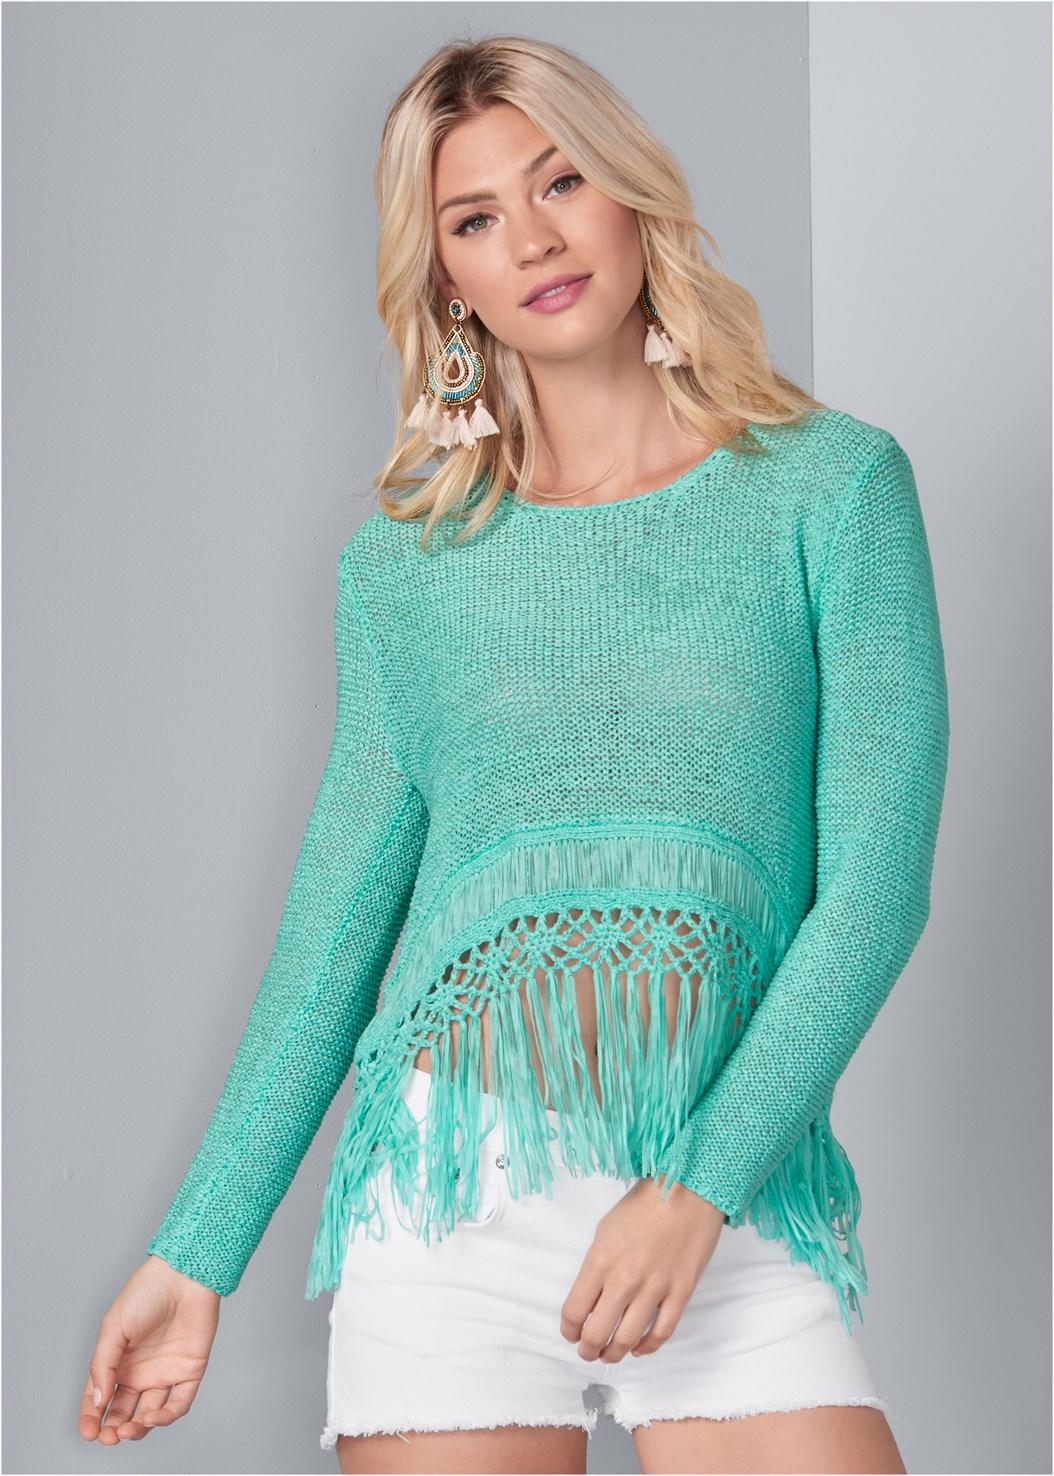 Fringe Open Knit Sweater,Everyday You Strapless Bra,Frayed Cut Off Jean Shorts,Multi Print Demi Bra,Multi Print Thong